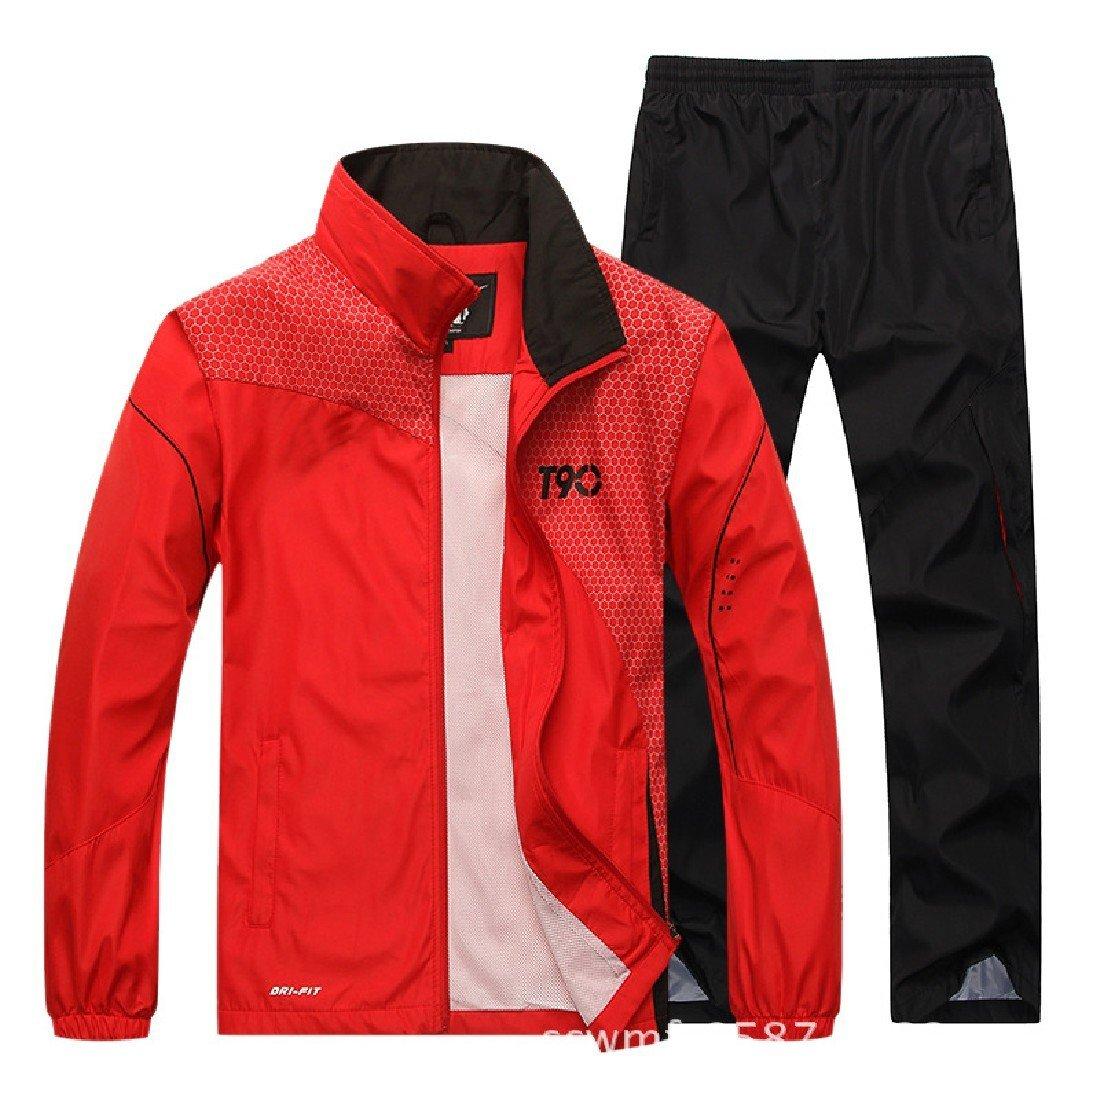 TaoNice Mens Sports Outdoor Summer Running Sweatsuit Pants Set